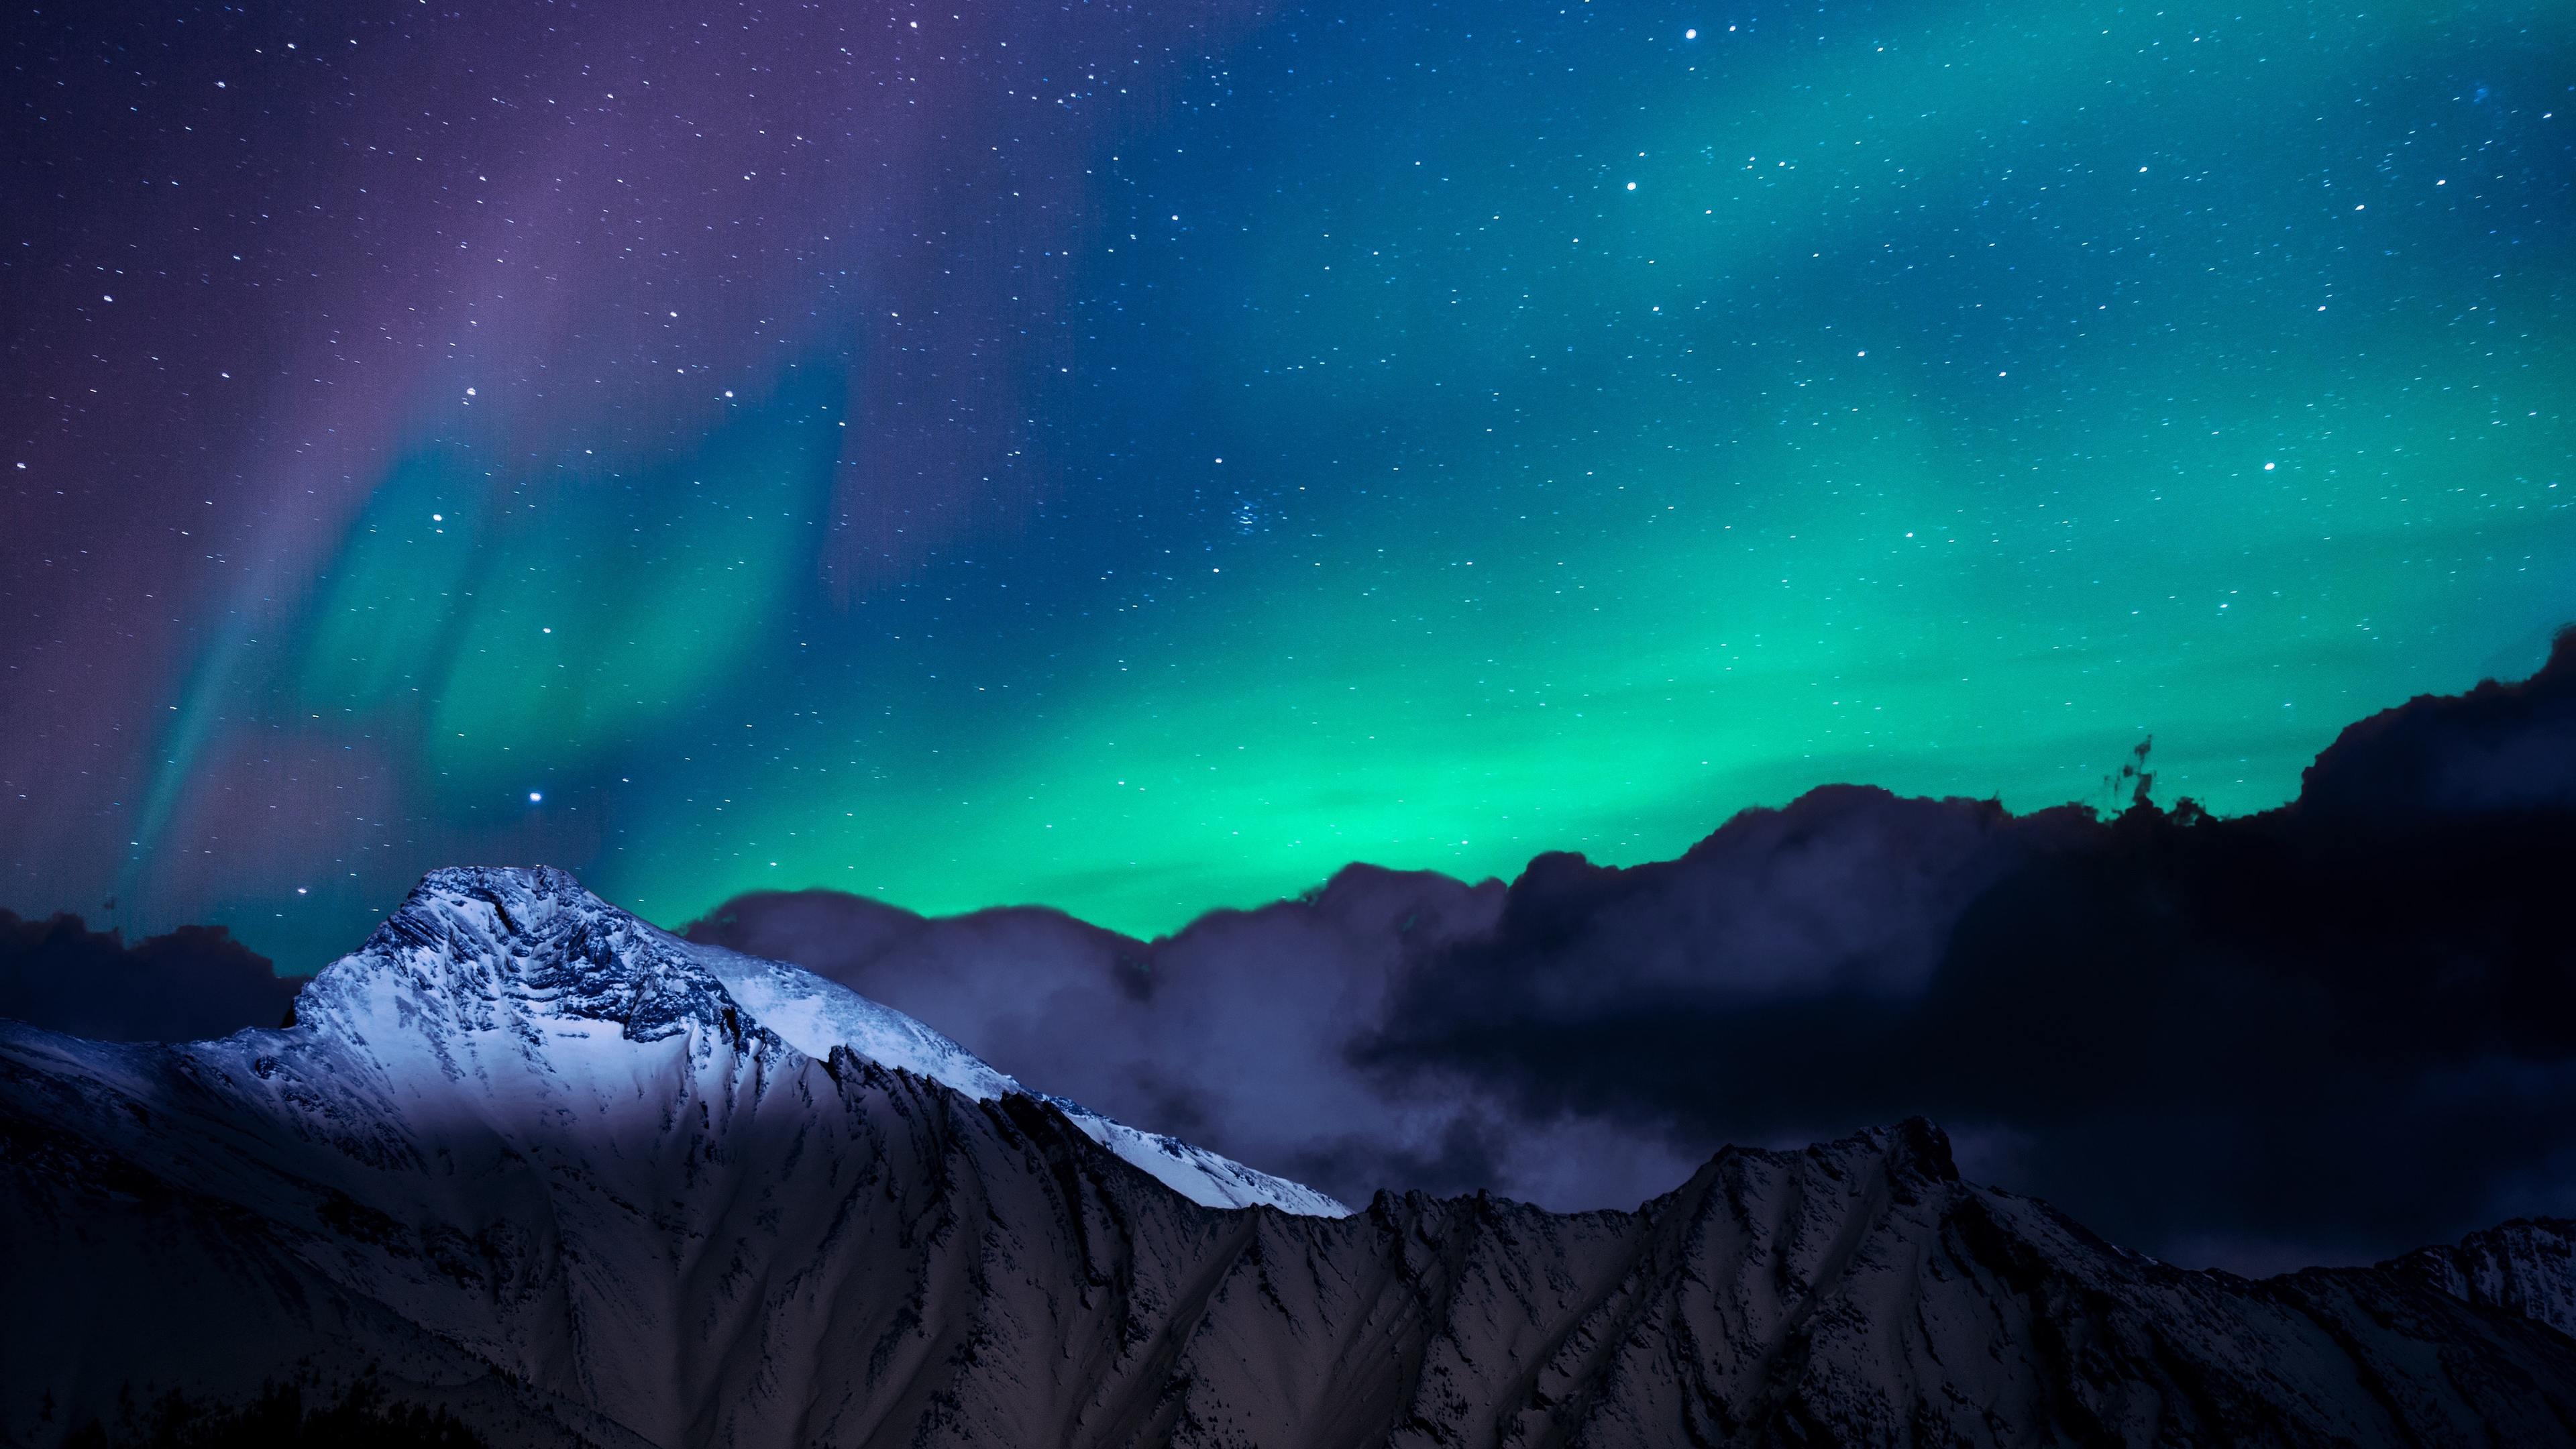 Wallpaper 4k Northern Lights Night Sky Mountains Landscape